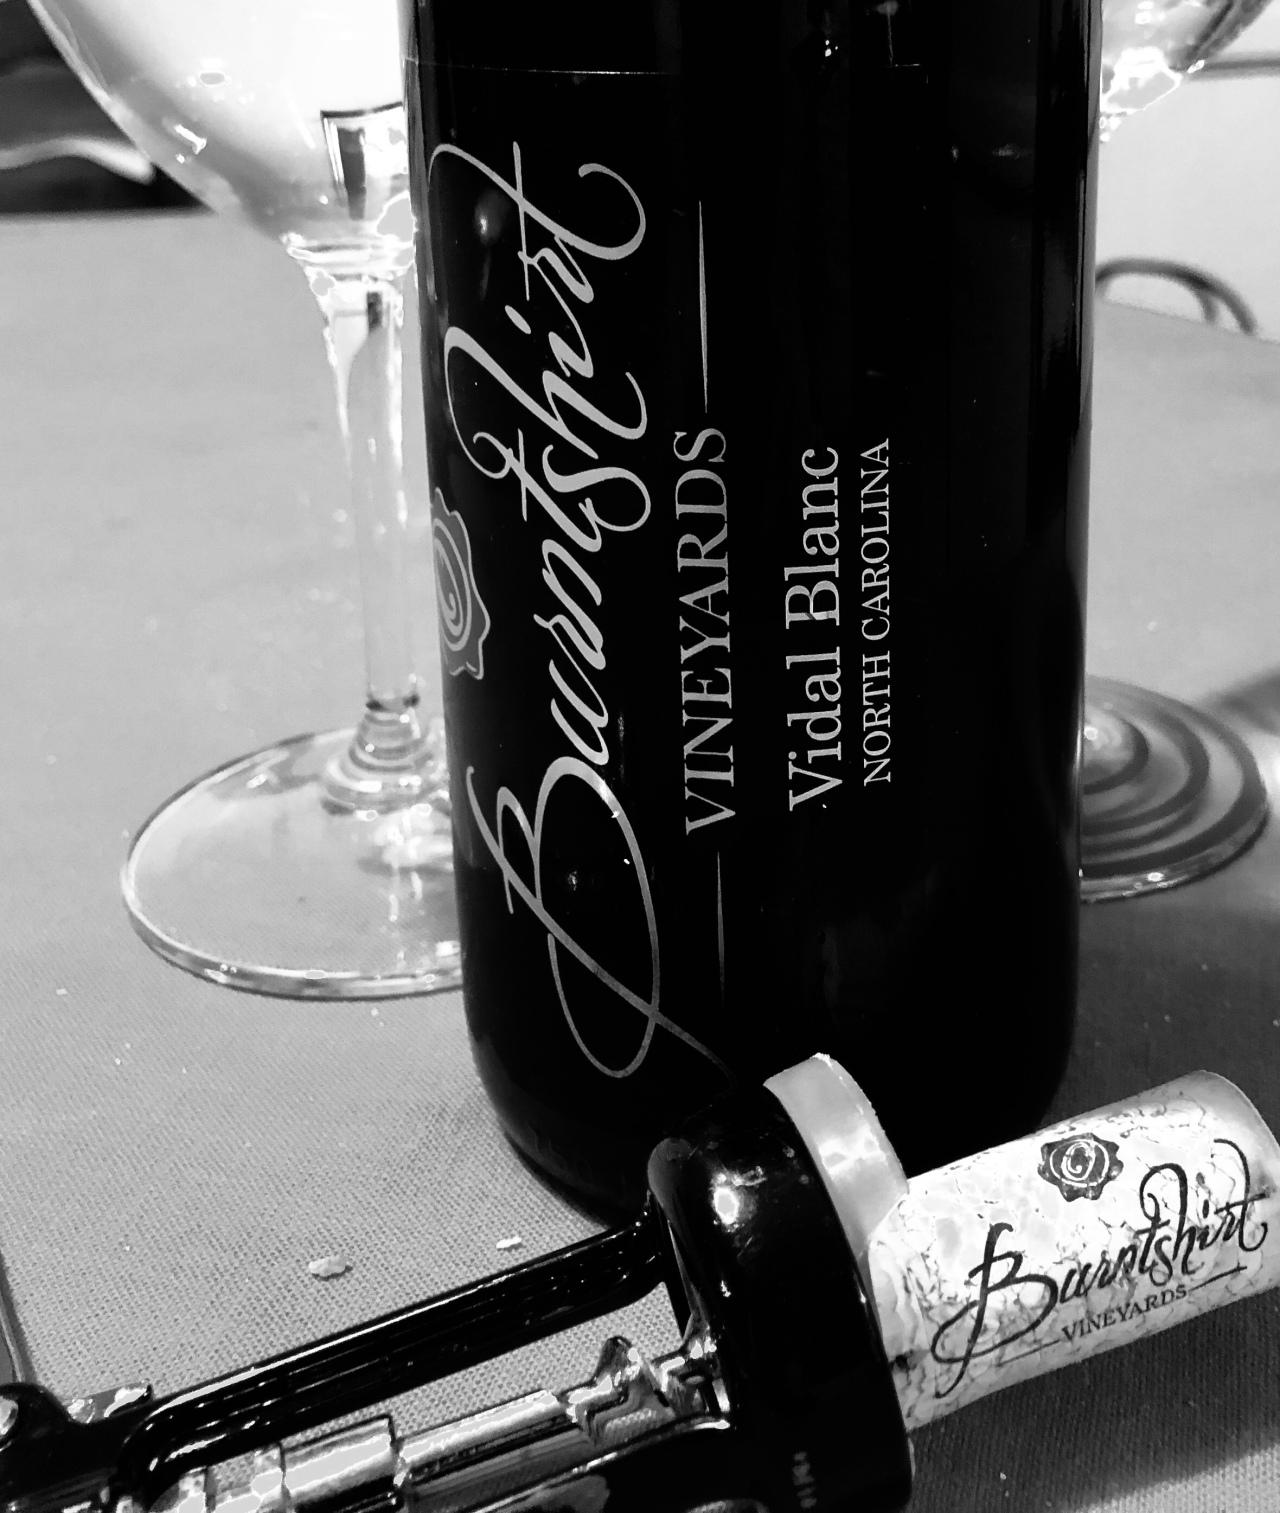 Our Wine Tonight: Vidal Blanc – BurntshirtVineyards